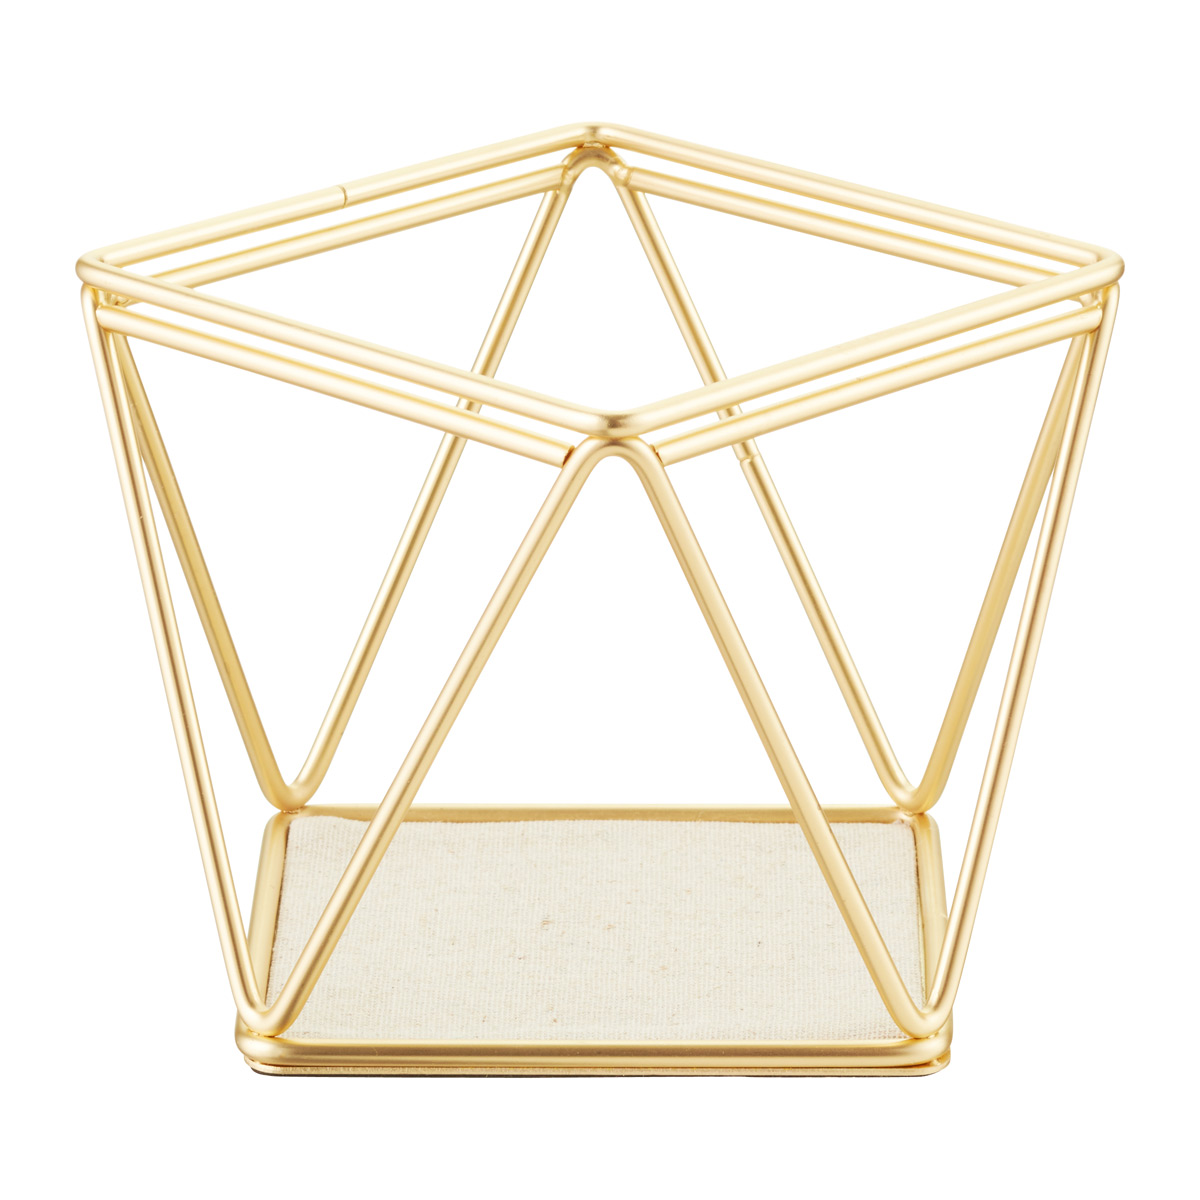 Umbra Gold Prisma Bracelet Earring Holder The Container Store